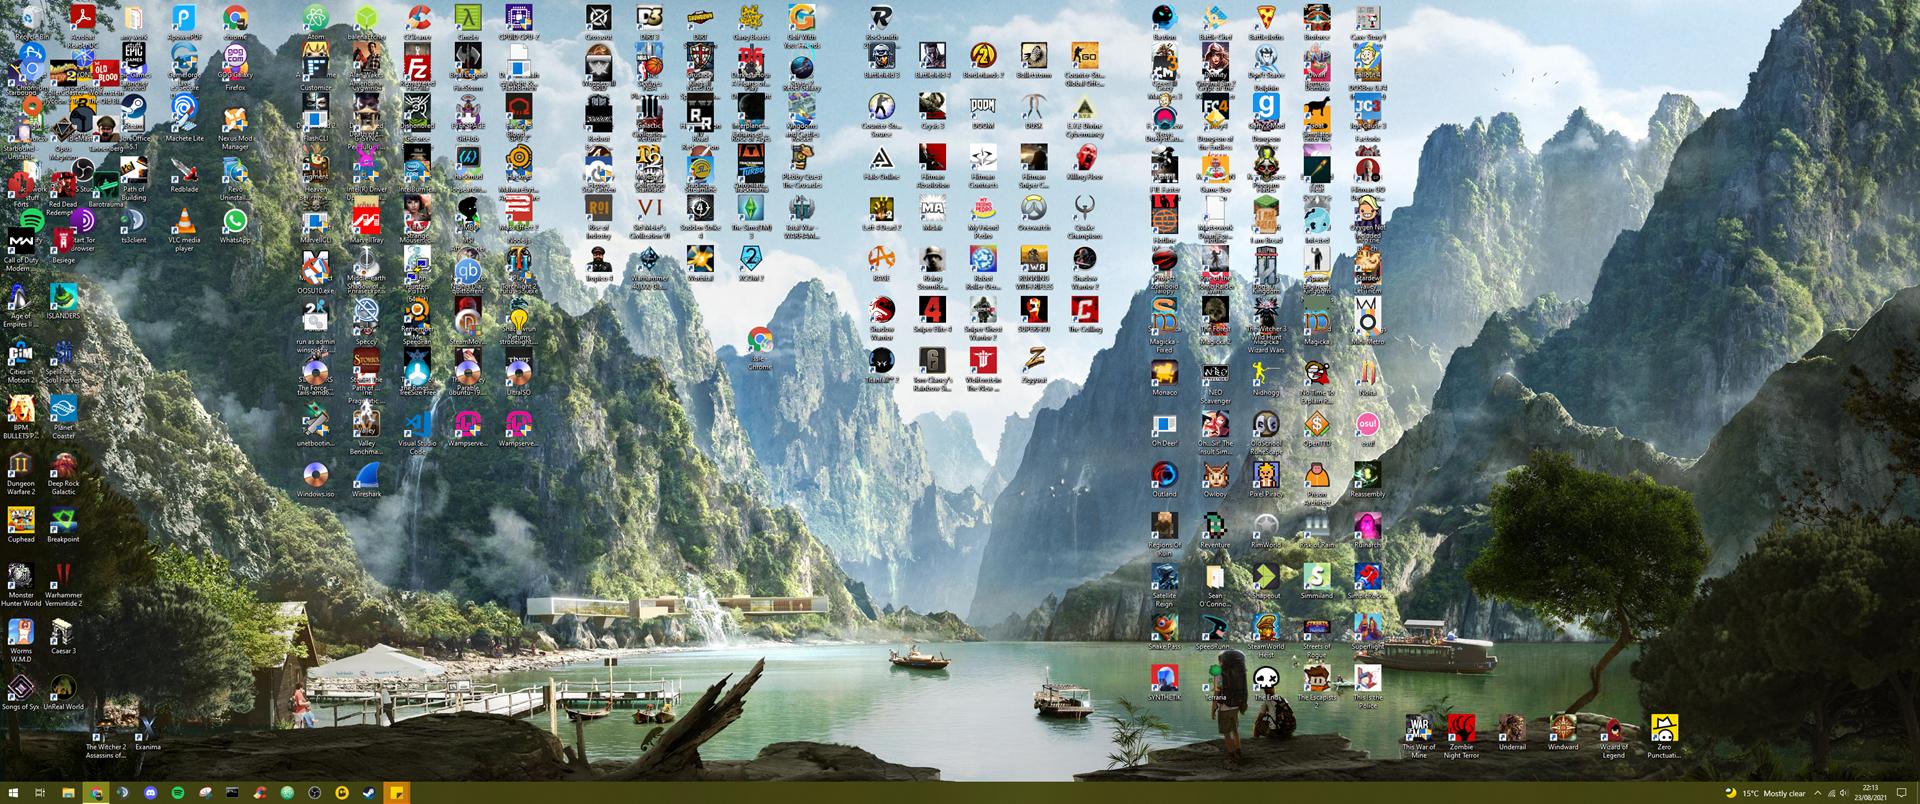 My desktop is now an unusable mess